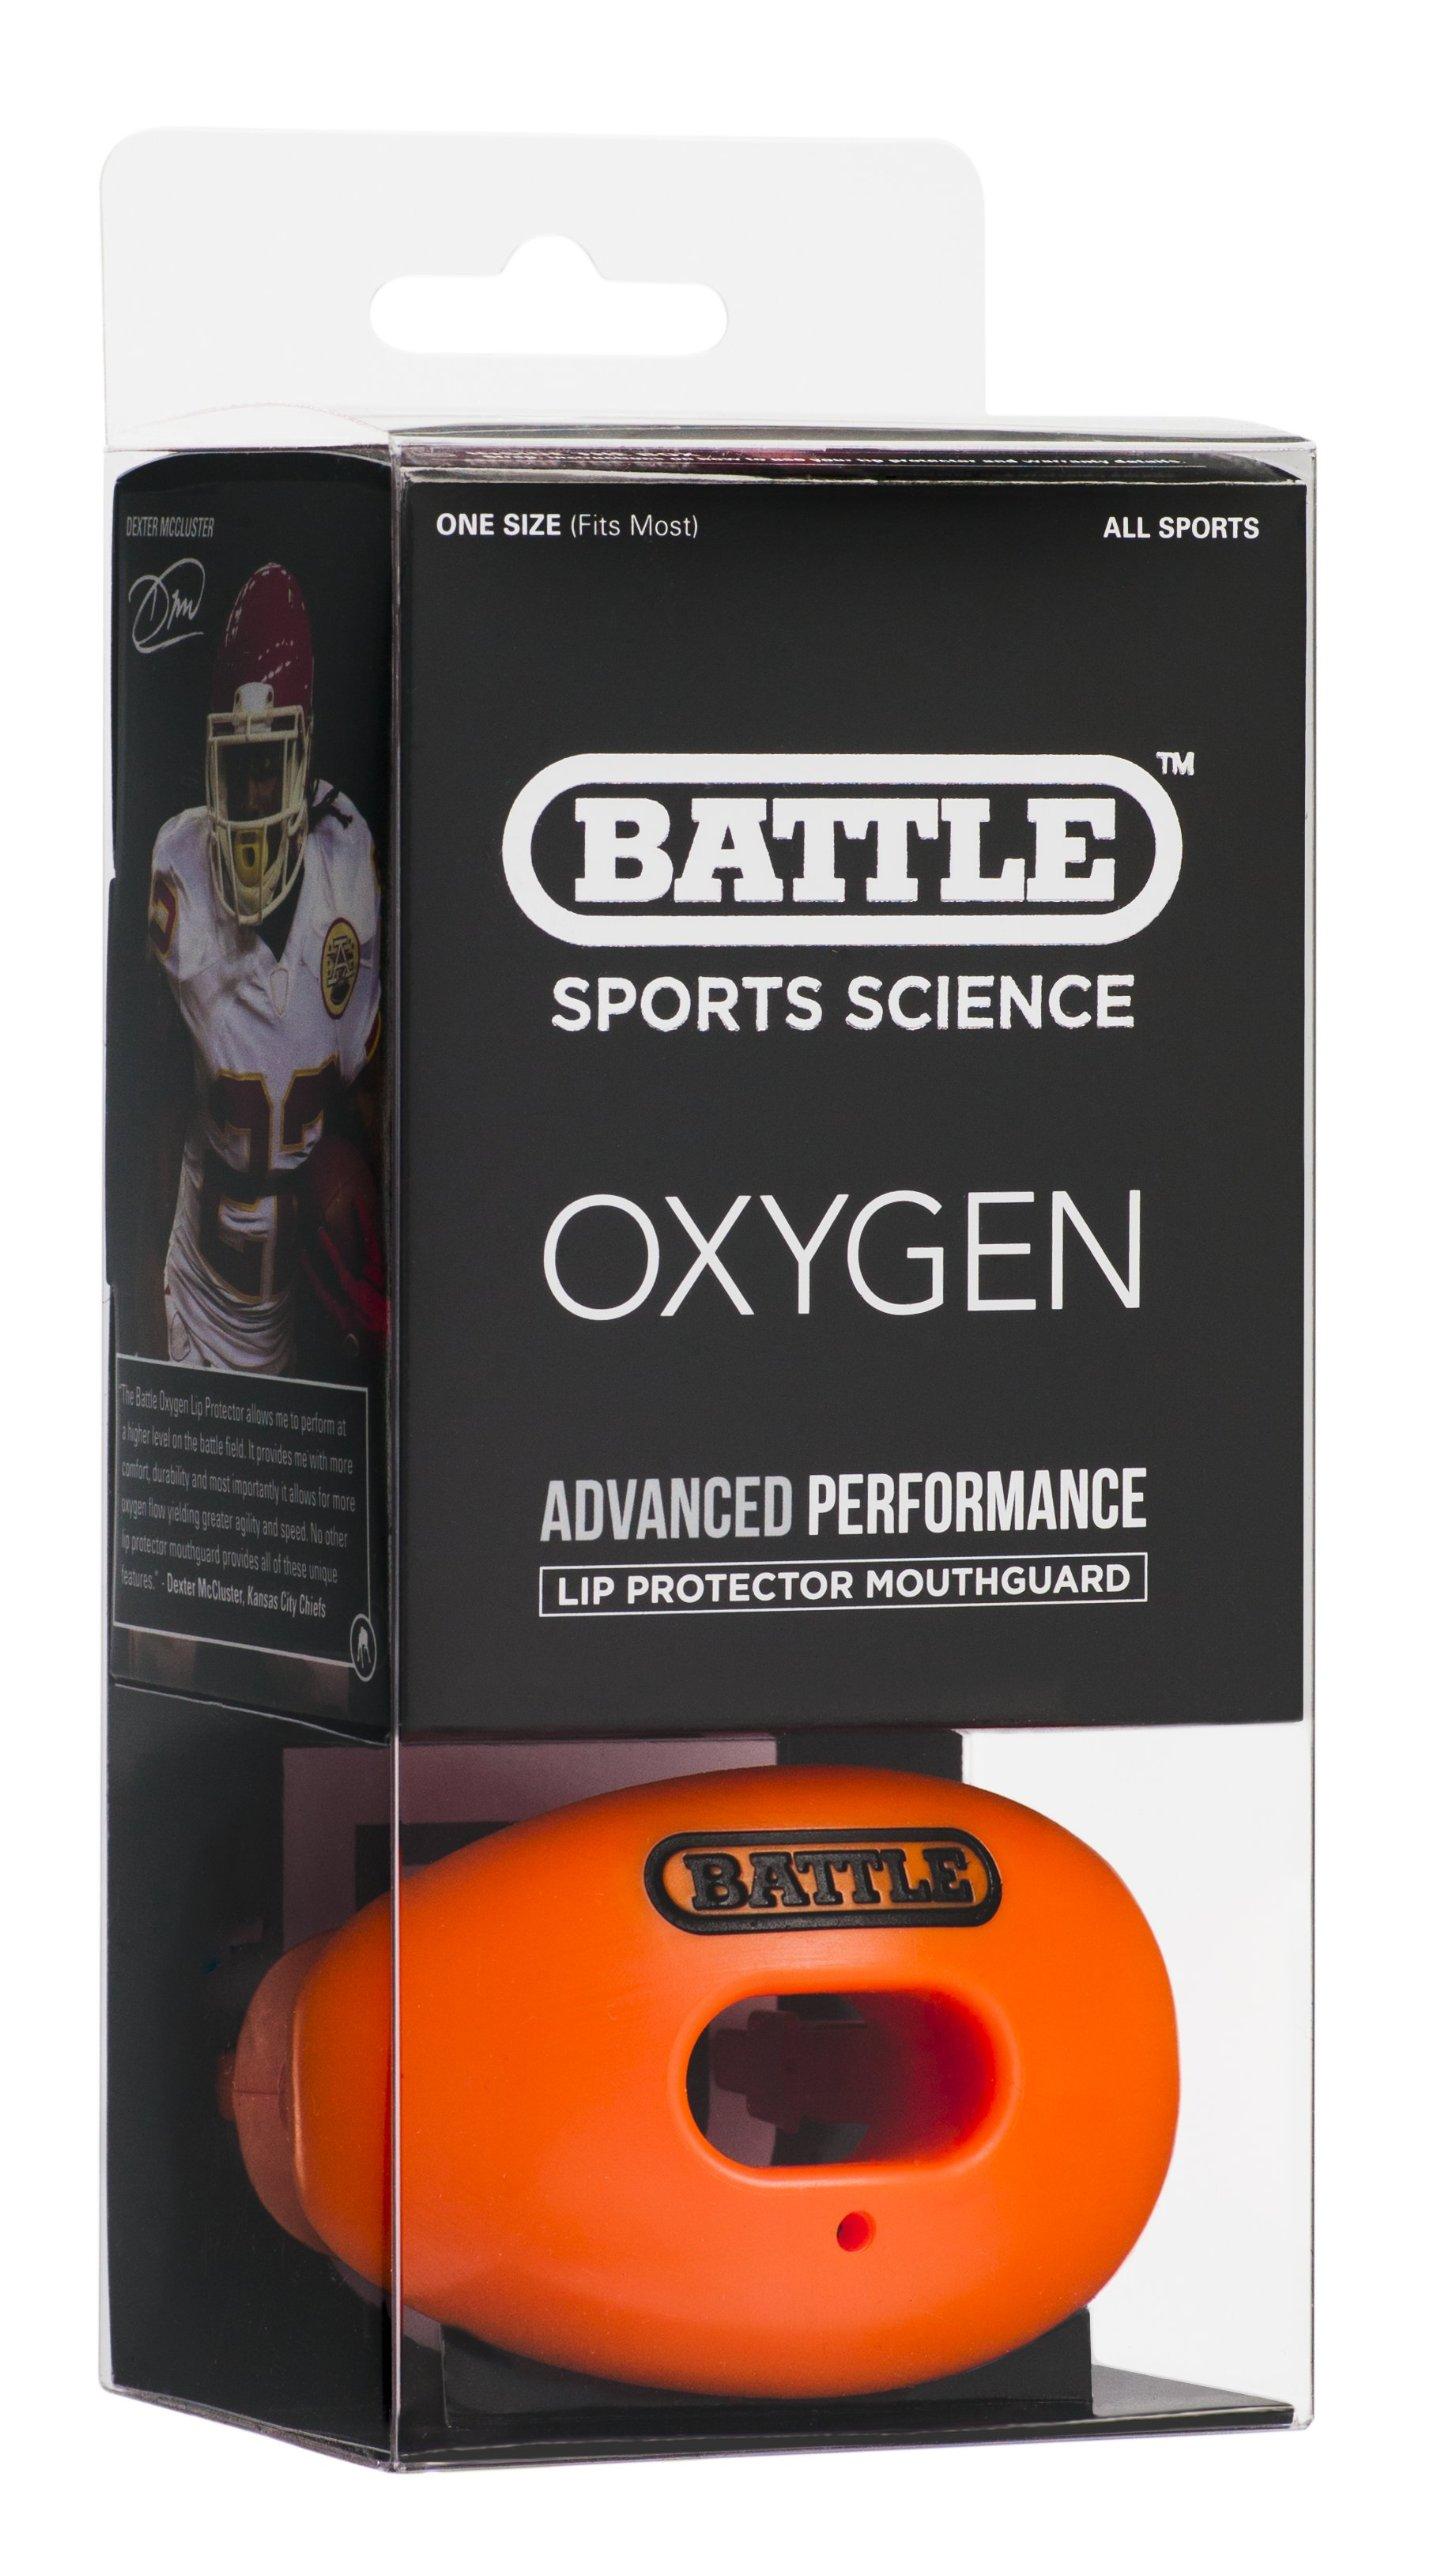 Battle Oxygen Lip Protector Mouthguard, Orange by Battle